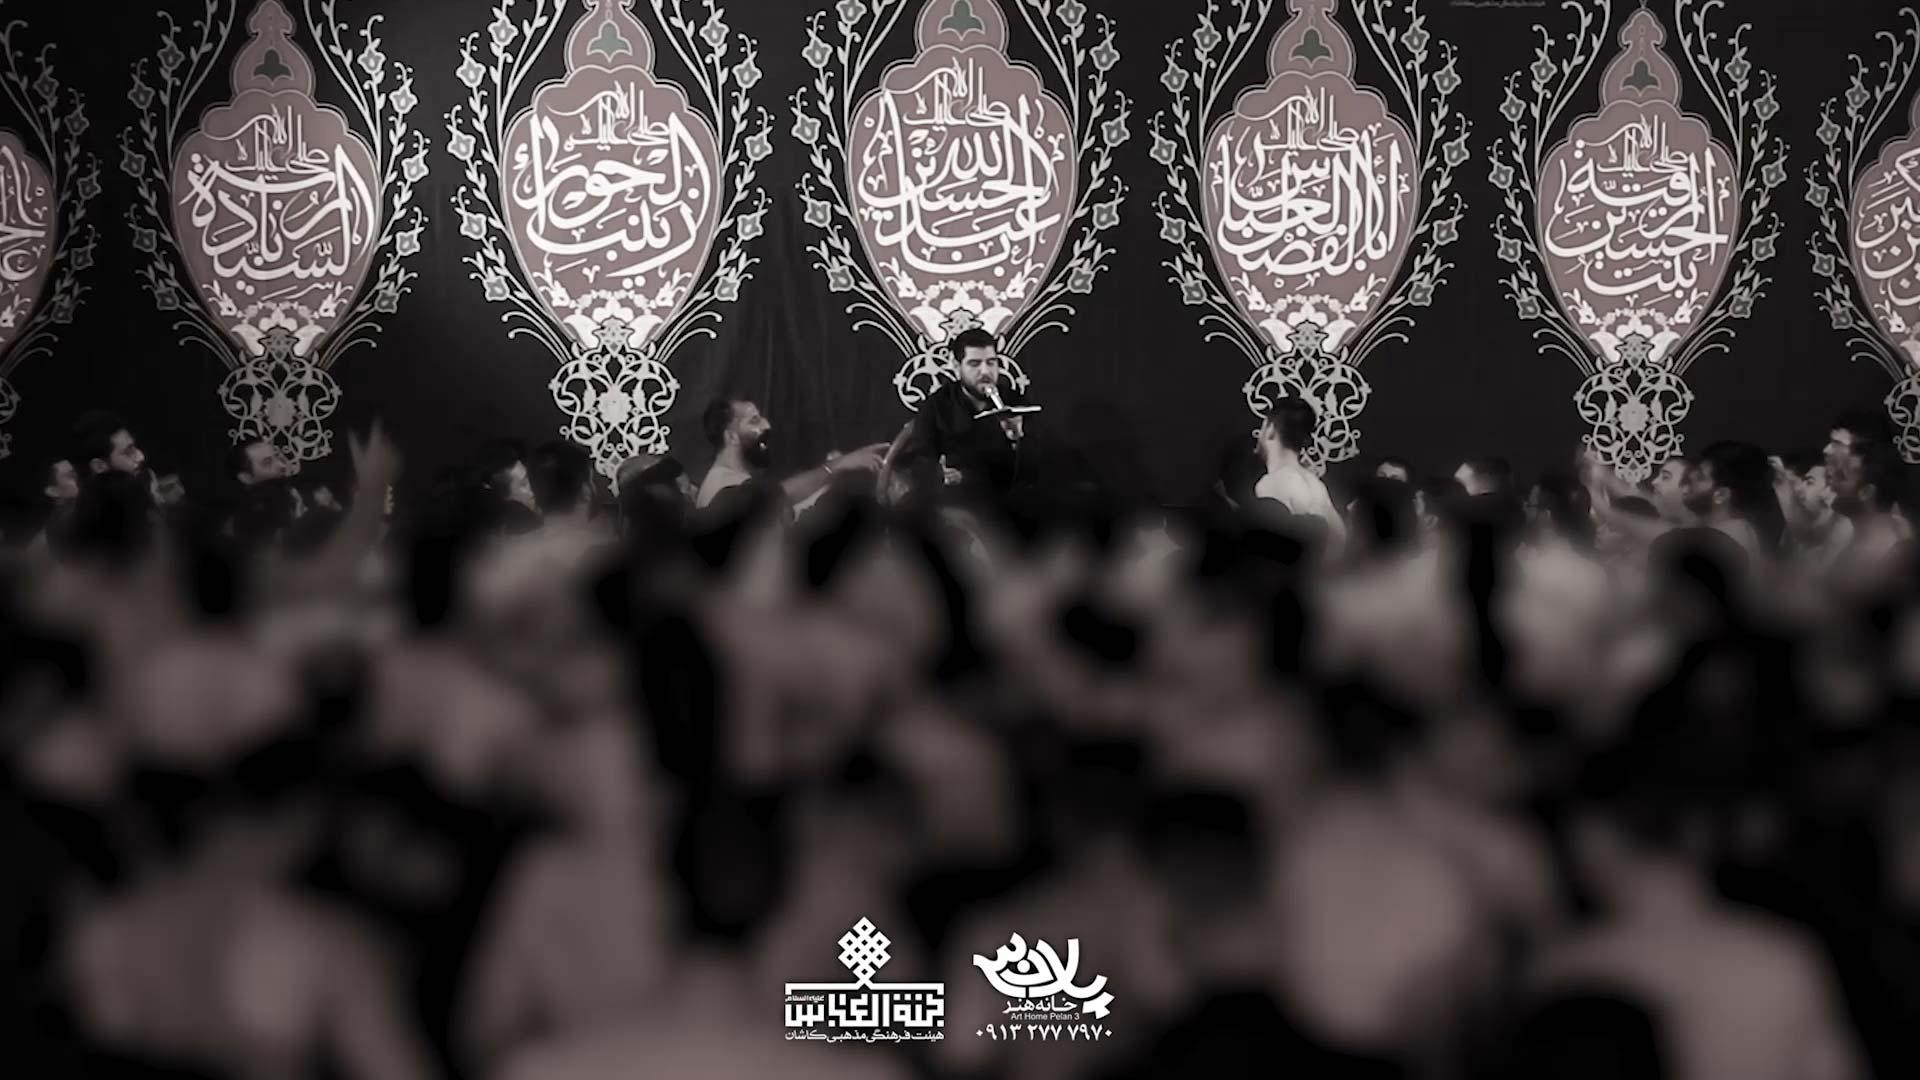 محرم آمد کاظم اکبری